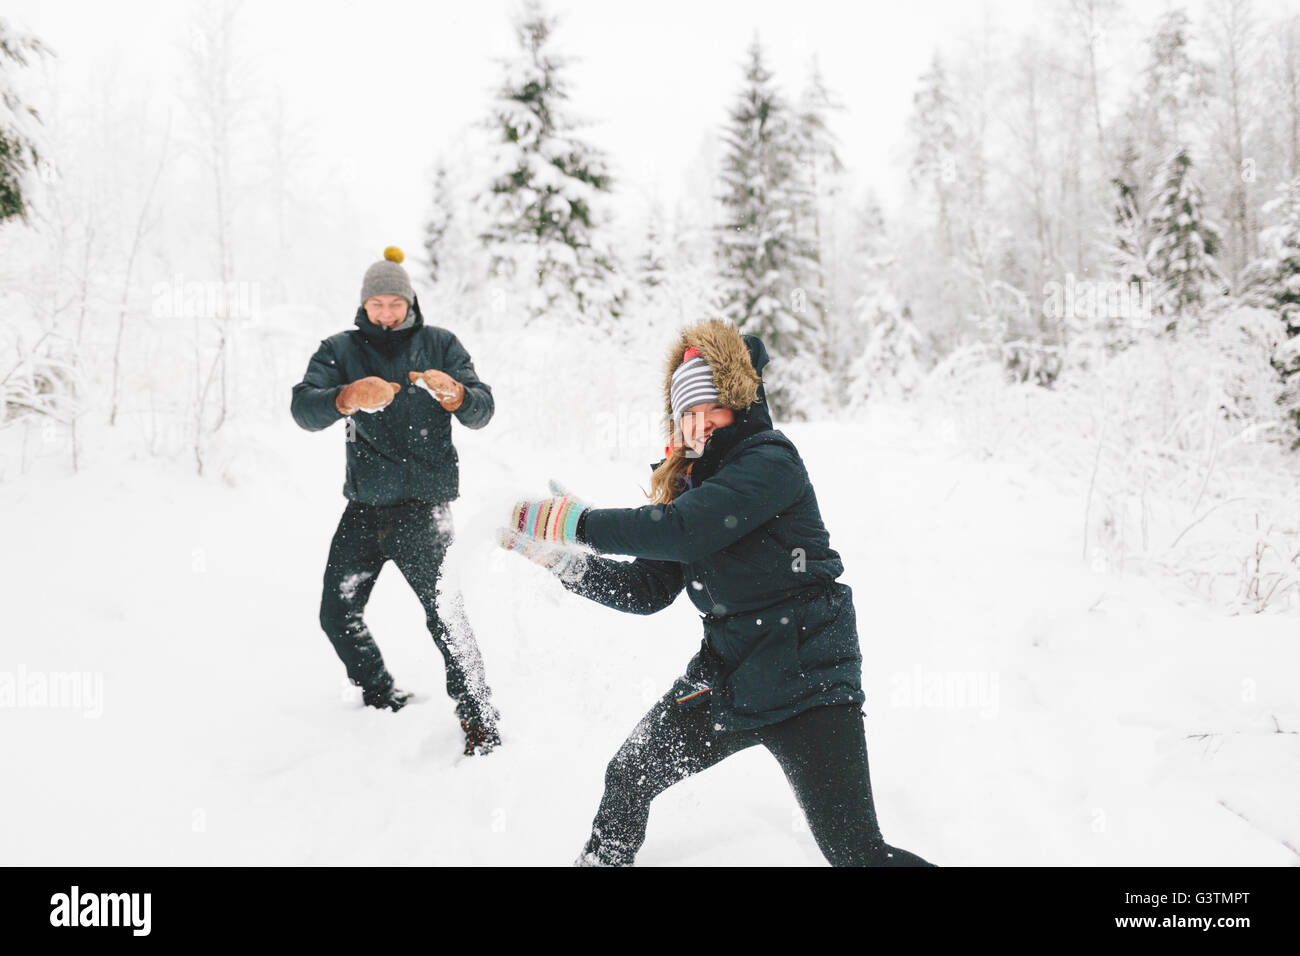 La Finlande, Jyvaskyla, Saakoski, Young couple having snowball fight Banque D'Images